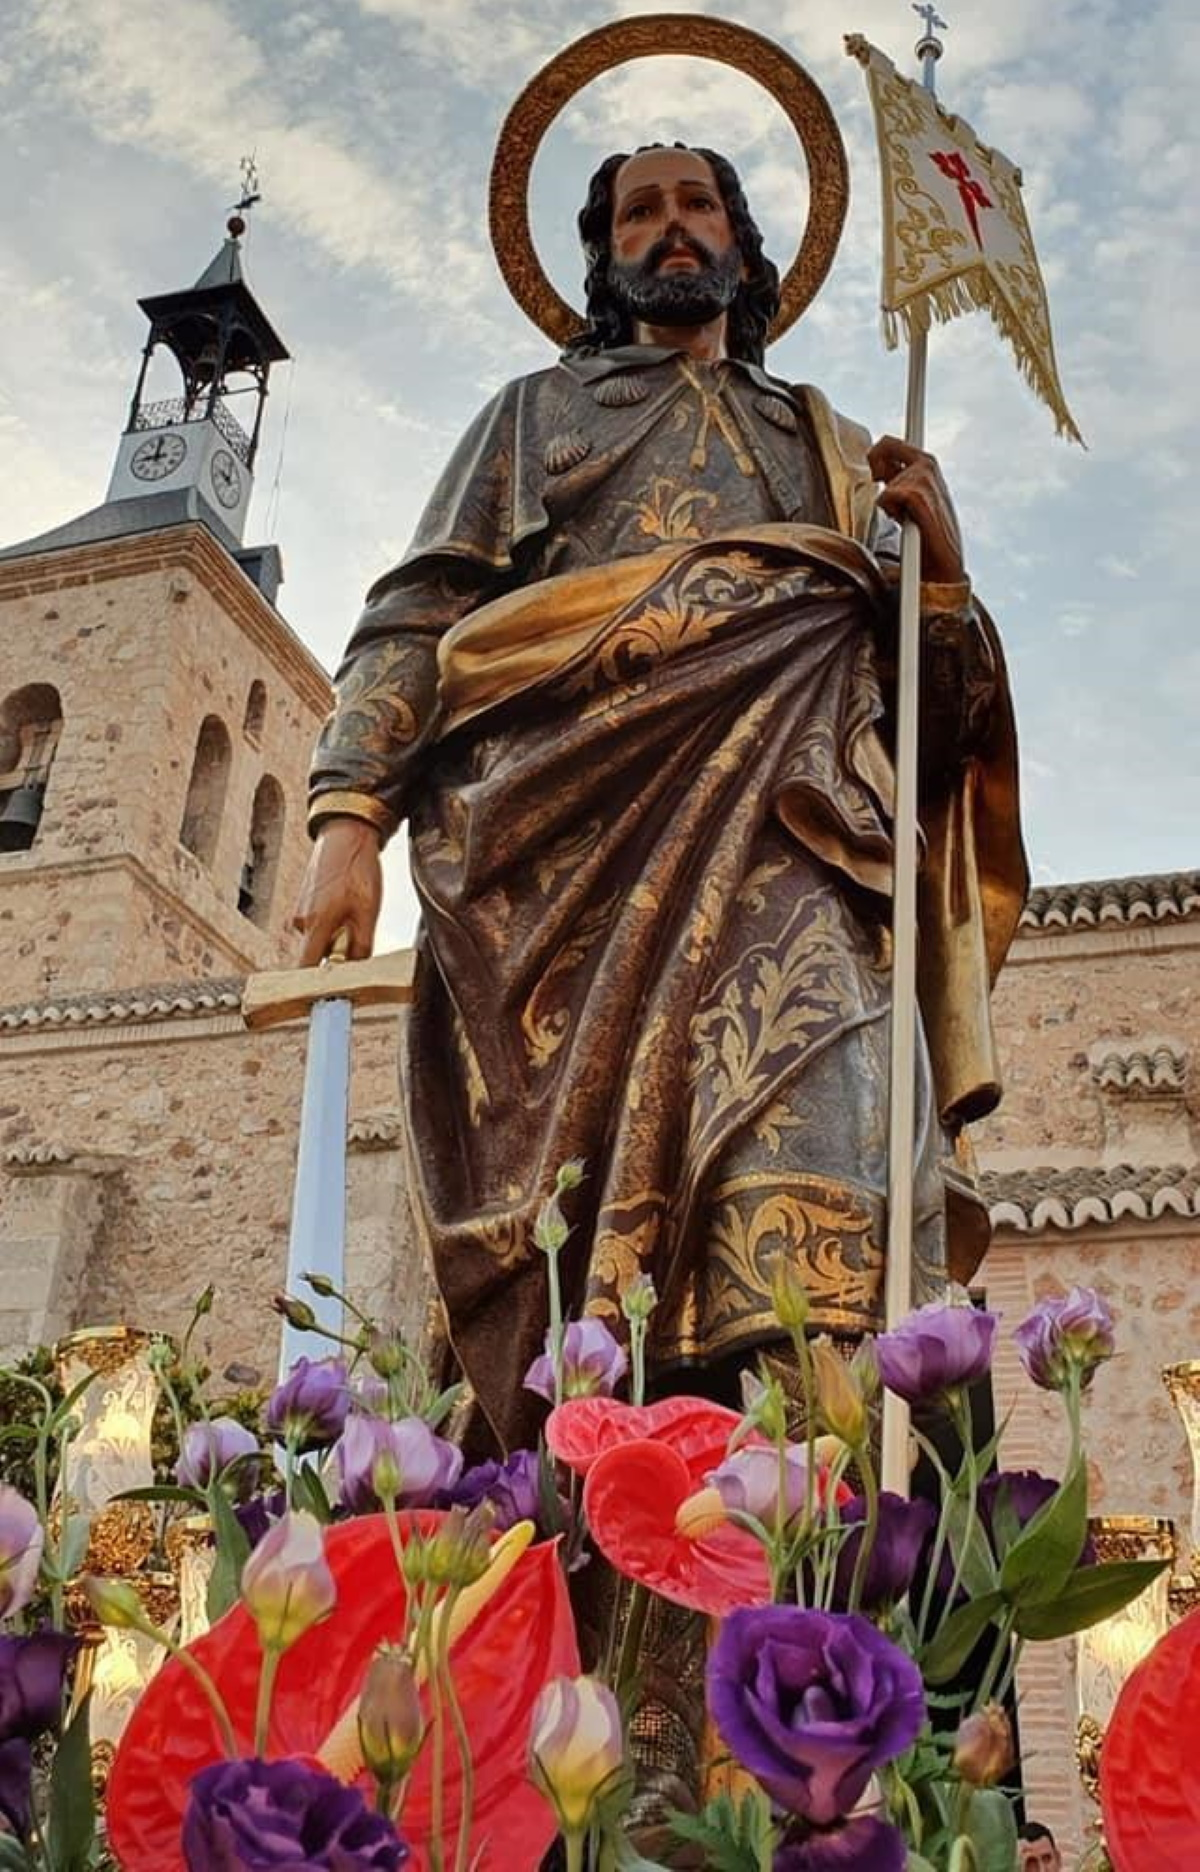 suspendidas fiestas santiago apostol carrion calatrava